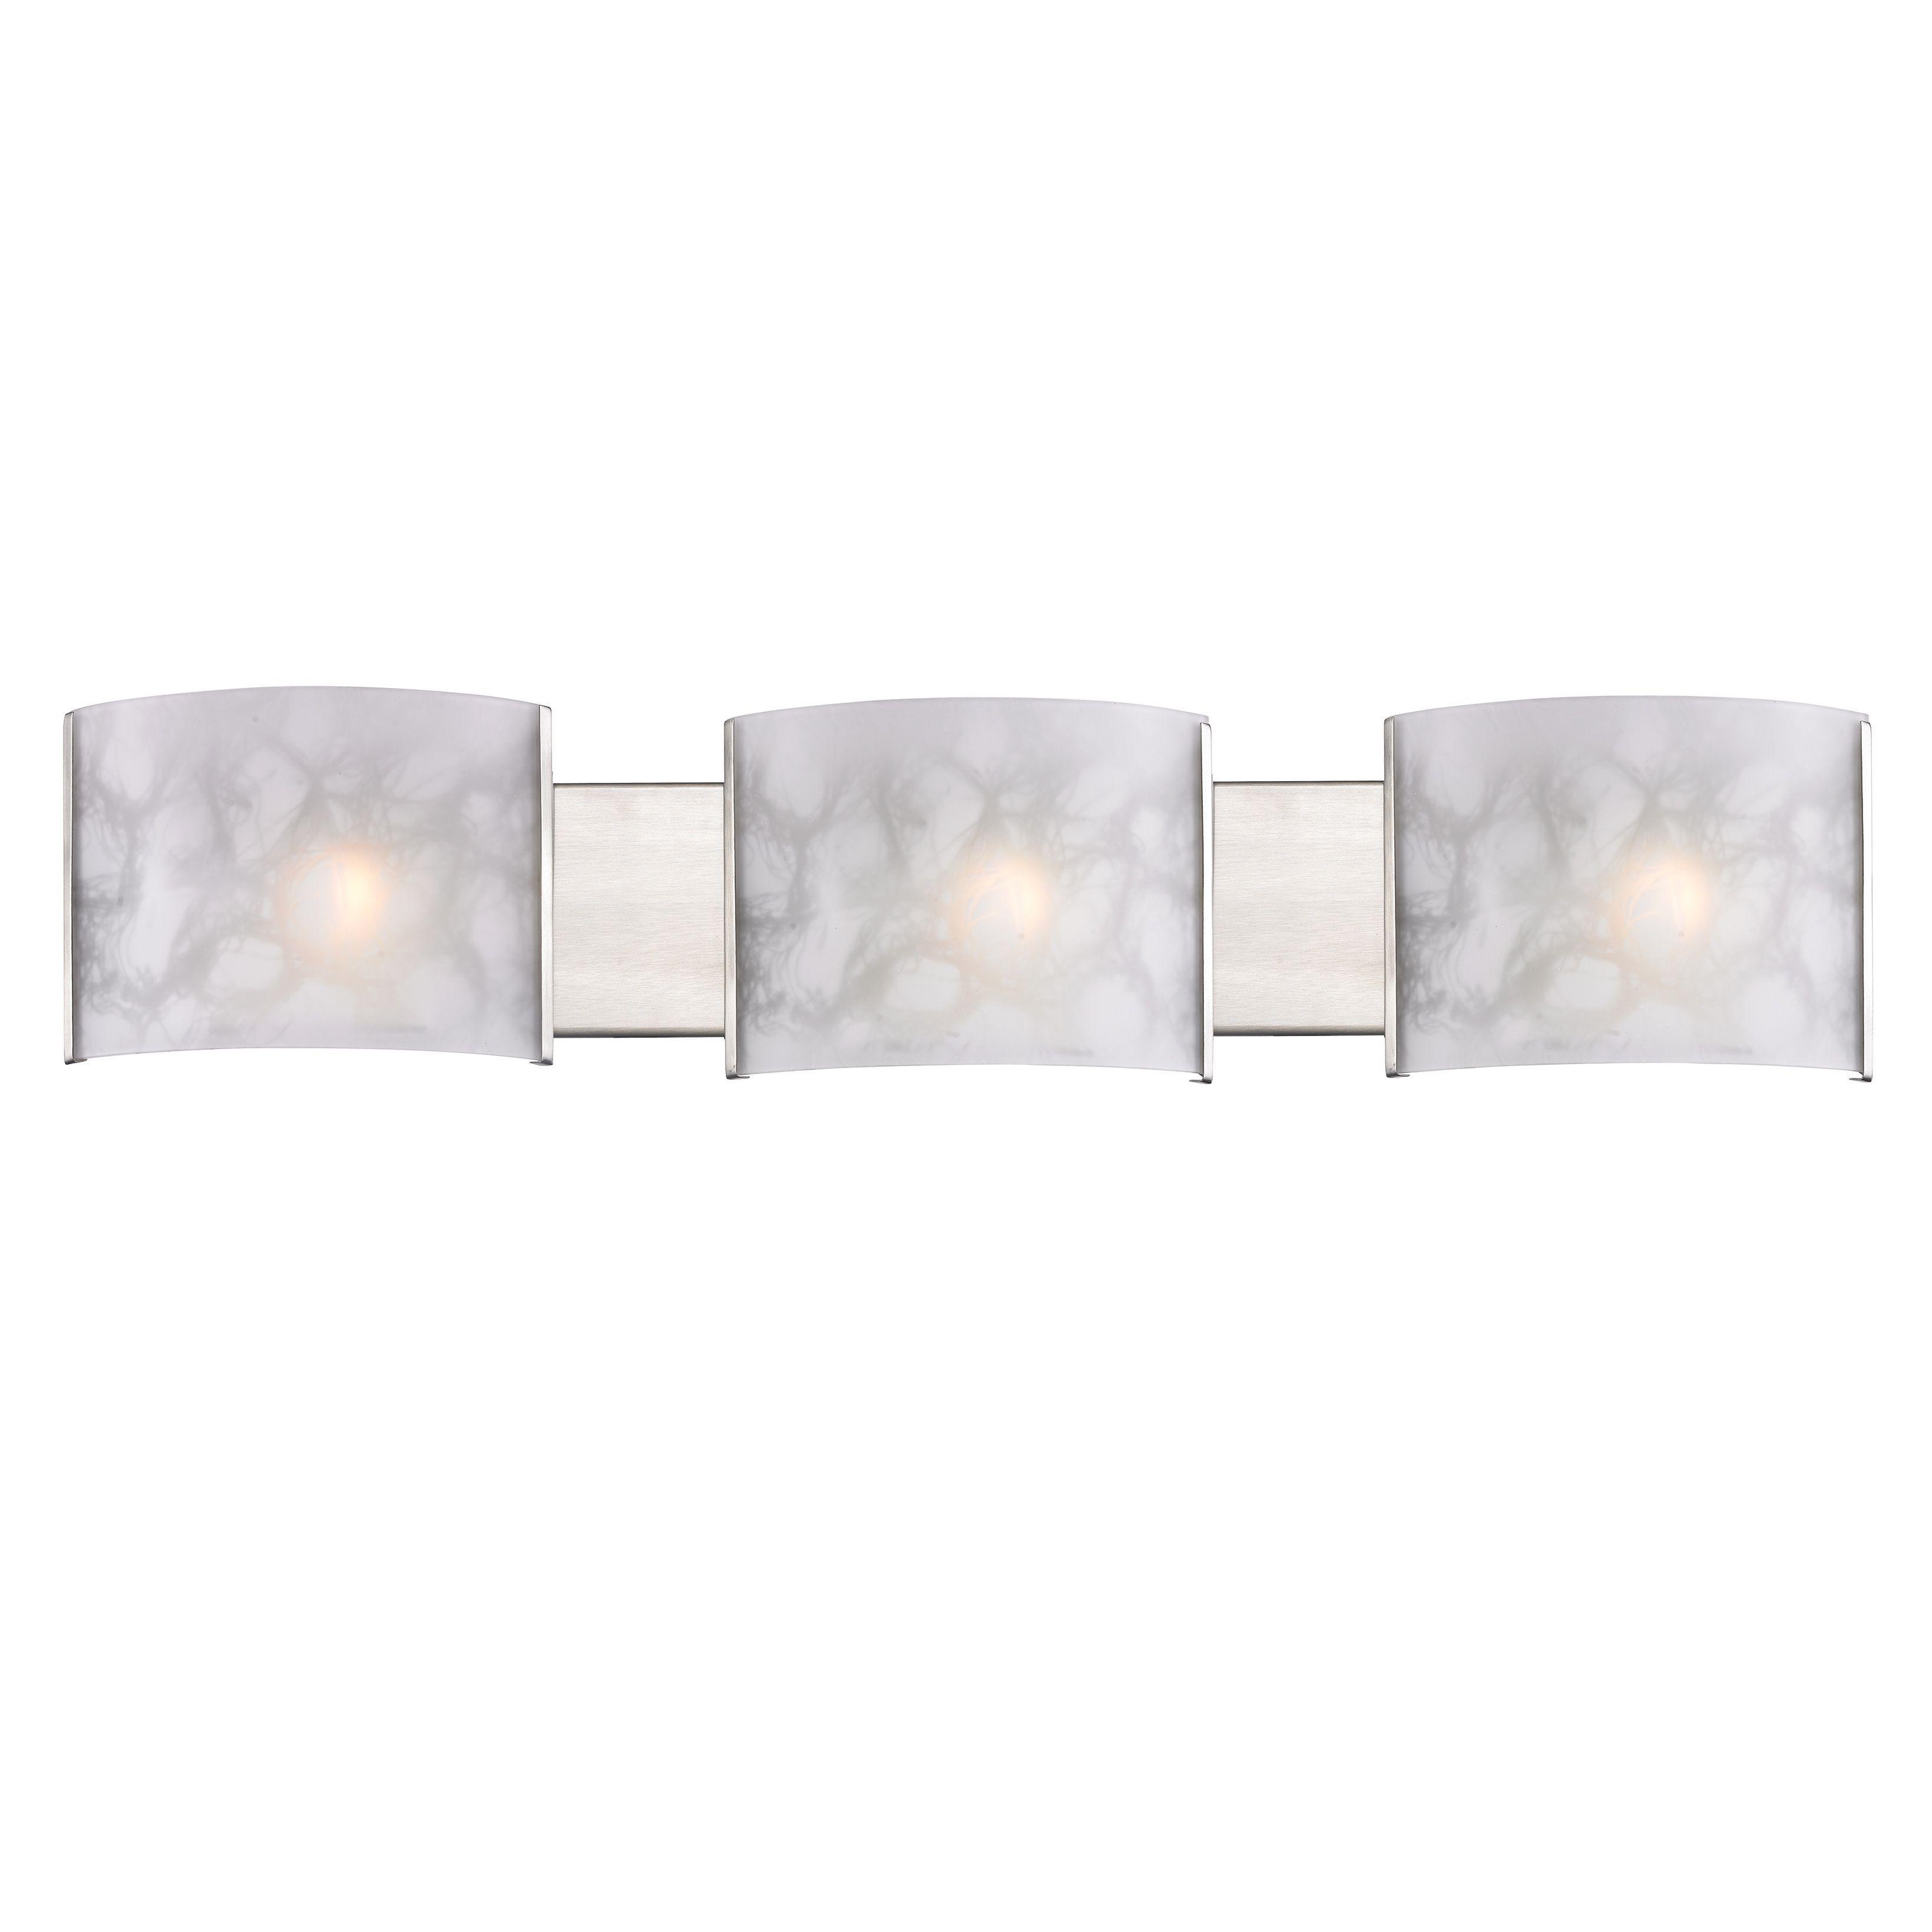 Zlite threelight semi flush indoor mount light by zlite more